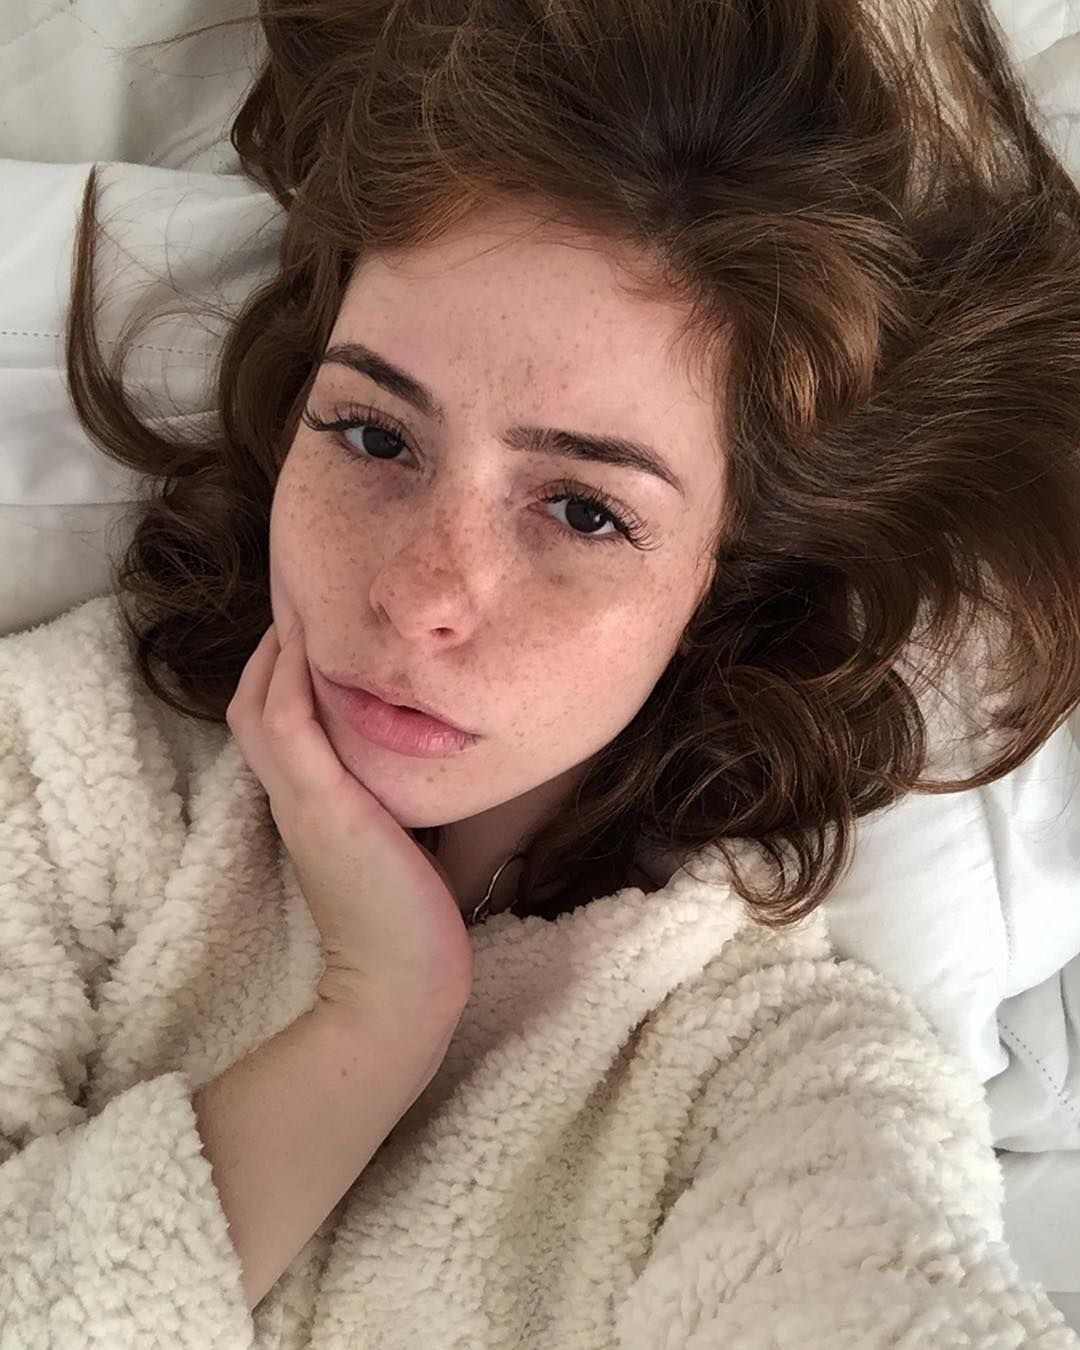 Celebrity Thays Vita naked (35 foto and video), Tits, Paparazzi, Selfie, legs 2018